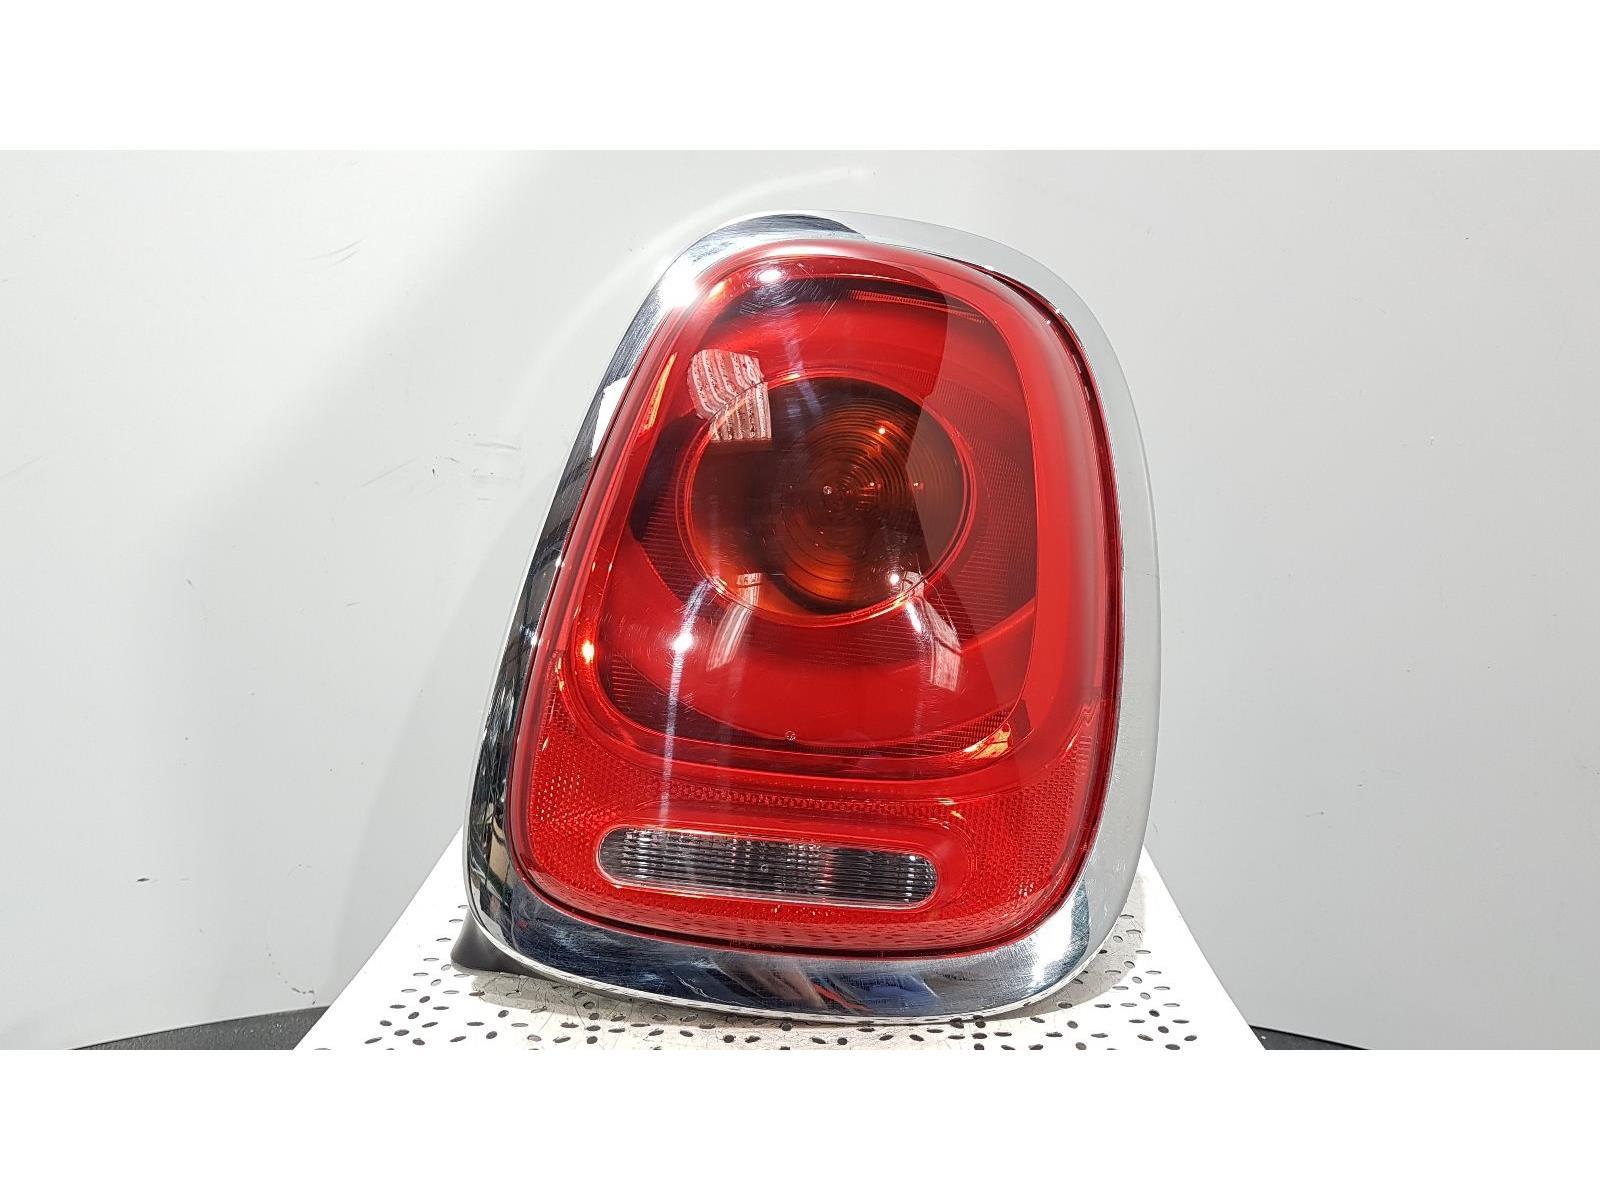 Mini Hatch - 2014 TO 2018 - O/S Drivers Rear Light (7297414-13)